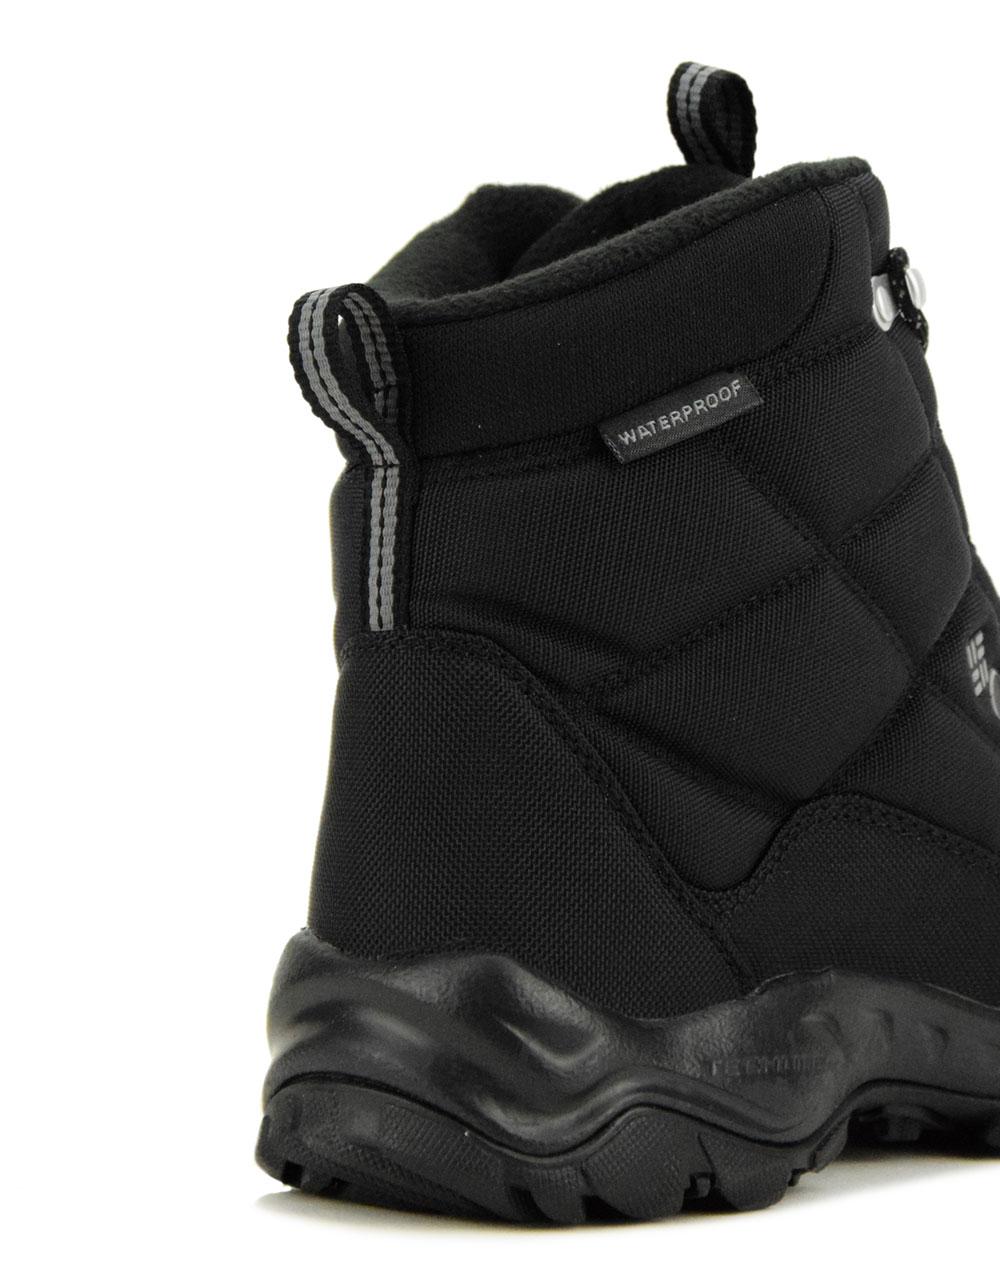 Columbia Firecamp Boot (BM1766-012) Black